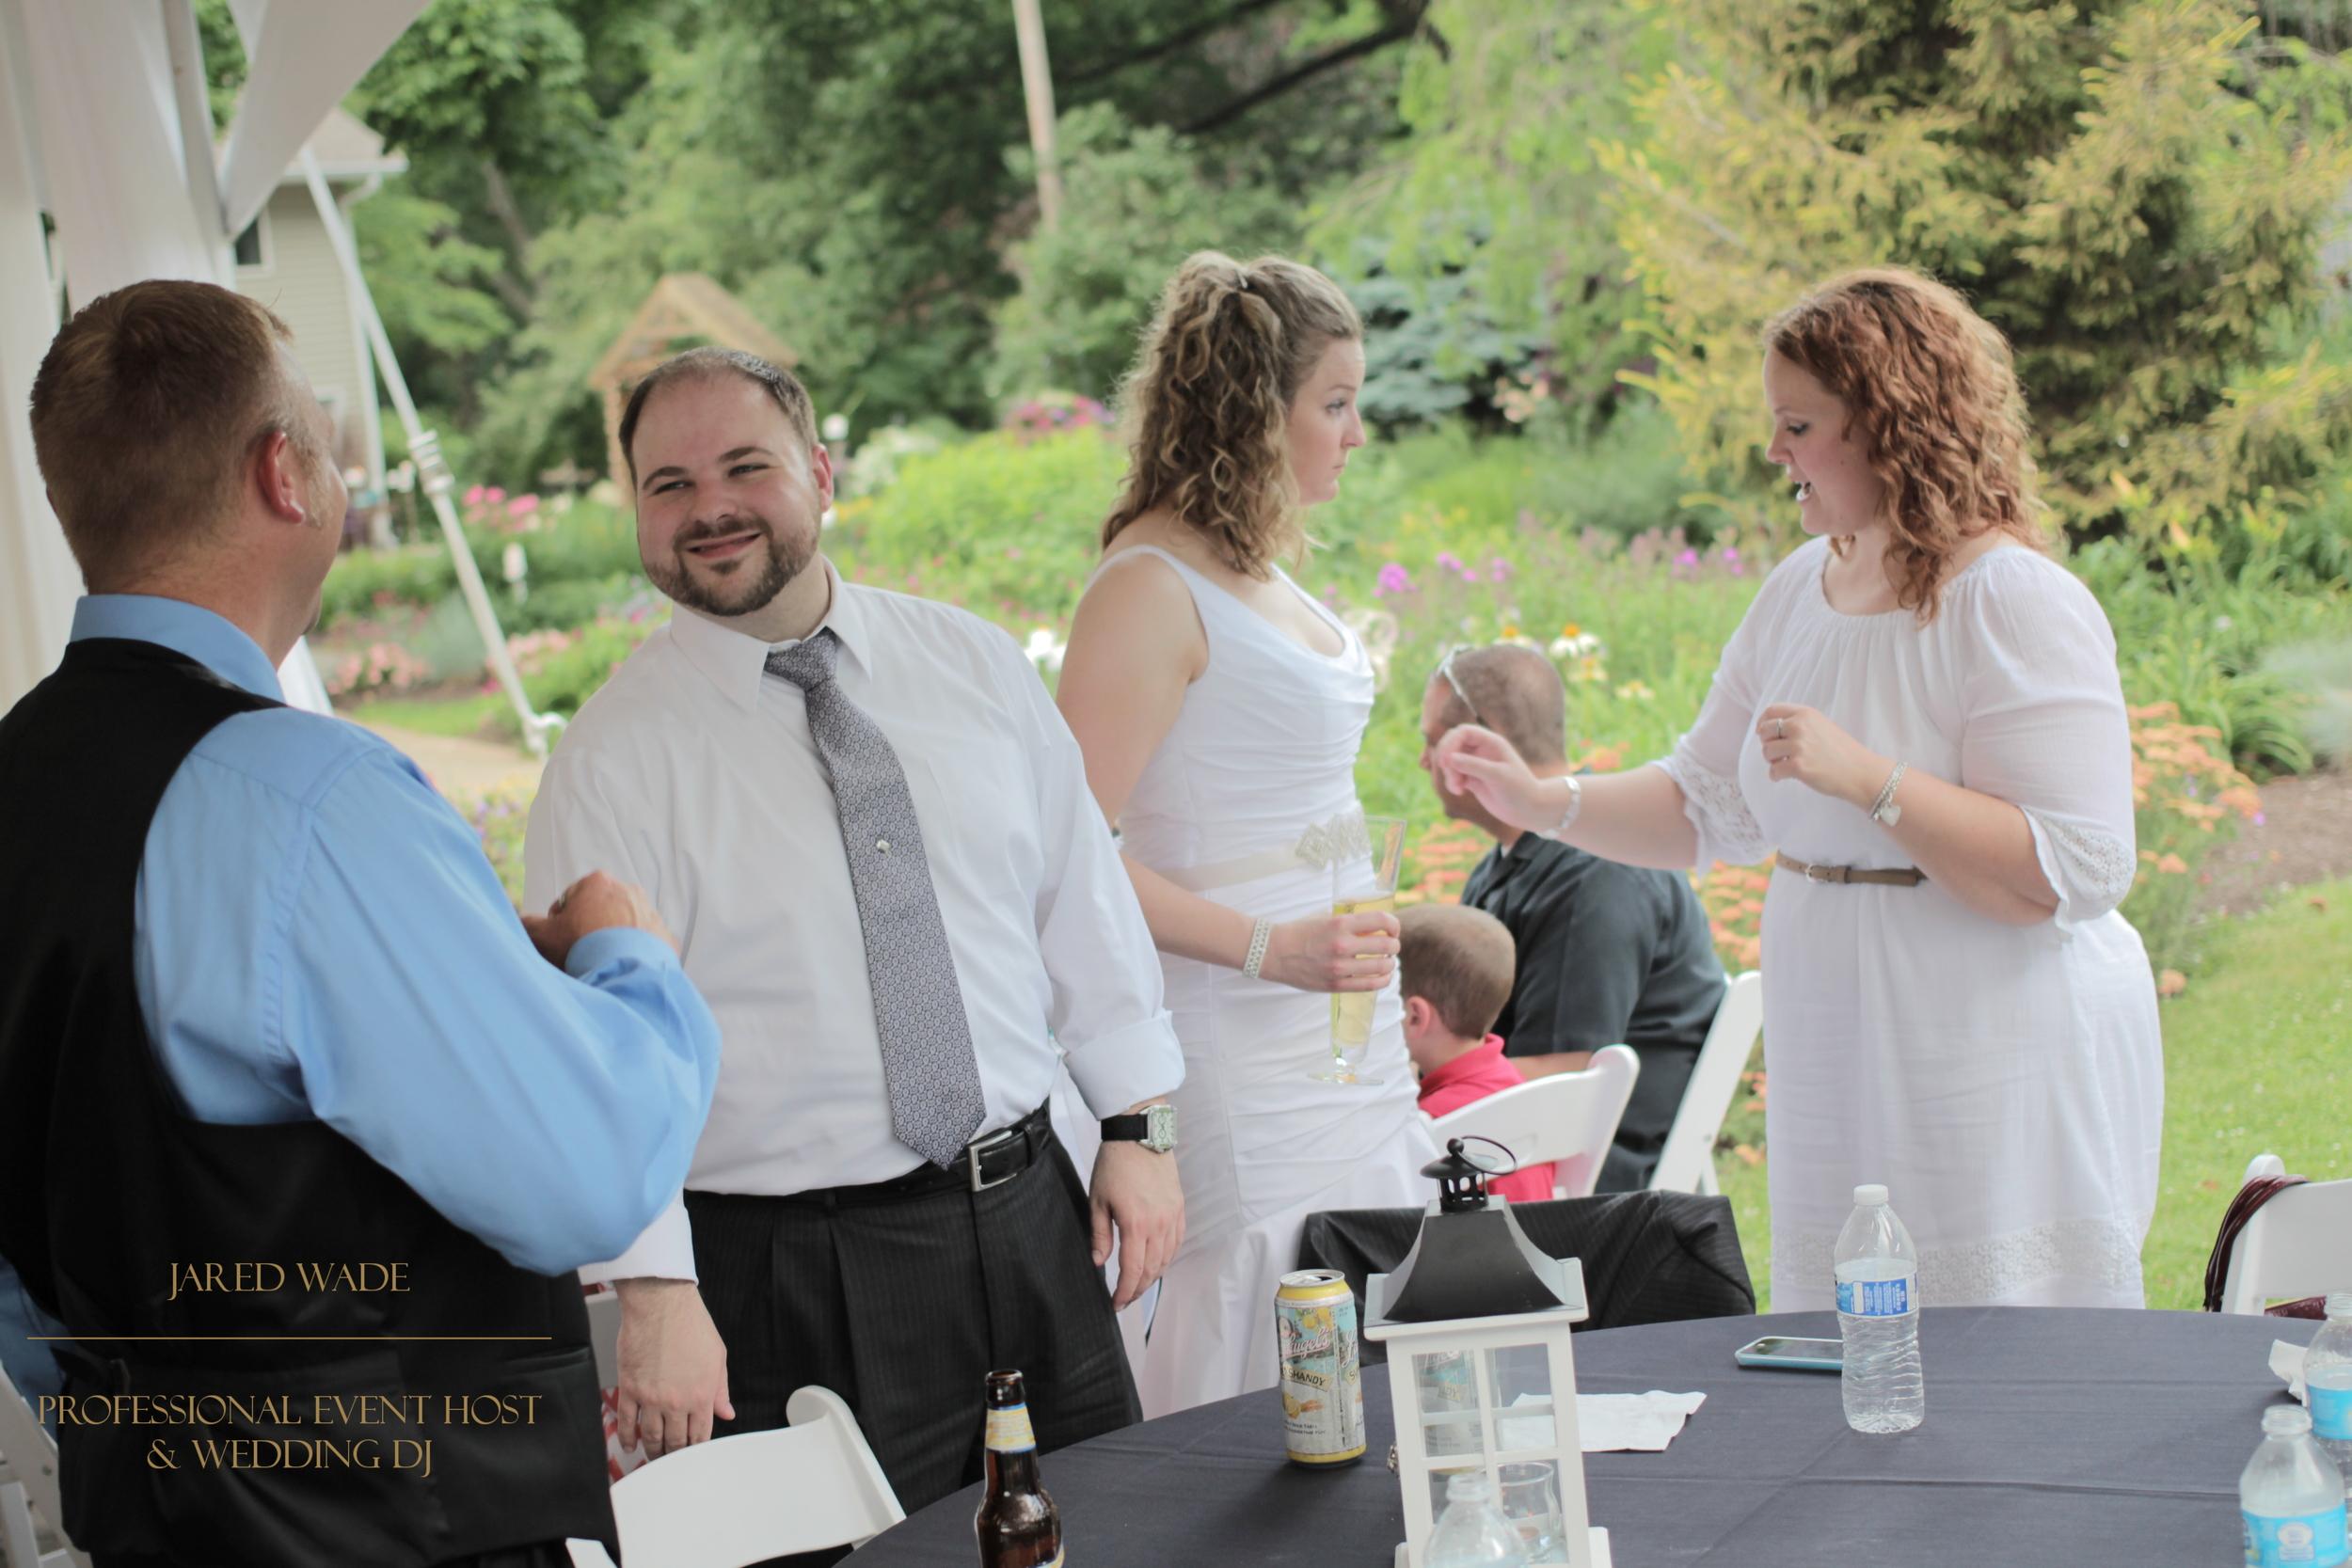 Jared Wade Professional Event Host | Indianapolis Wedding DJ | Avon Gardens | Brenda's Cakes And Catering | Indianapolis Indiana Wedding | Ashley And Dustin Wedding